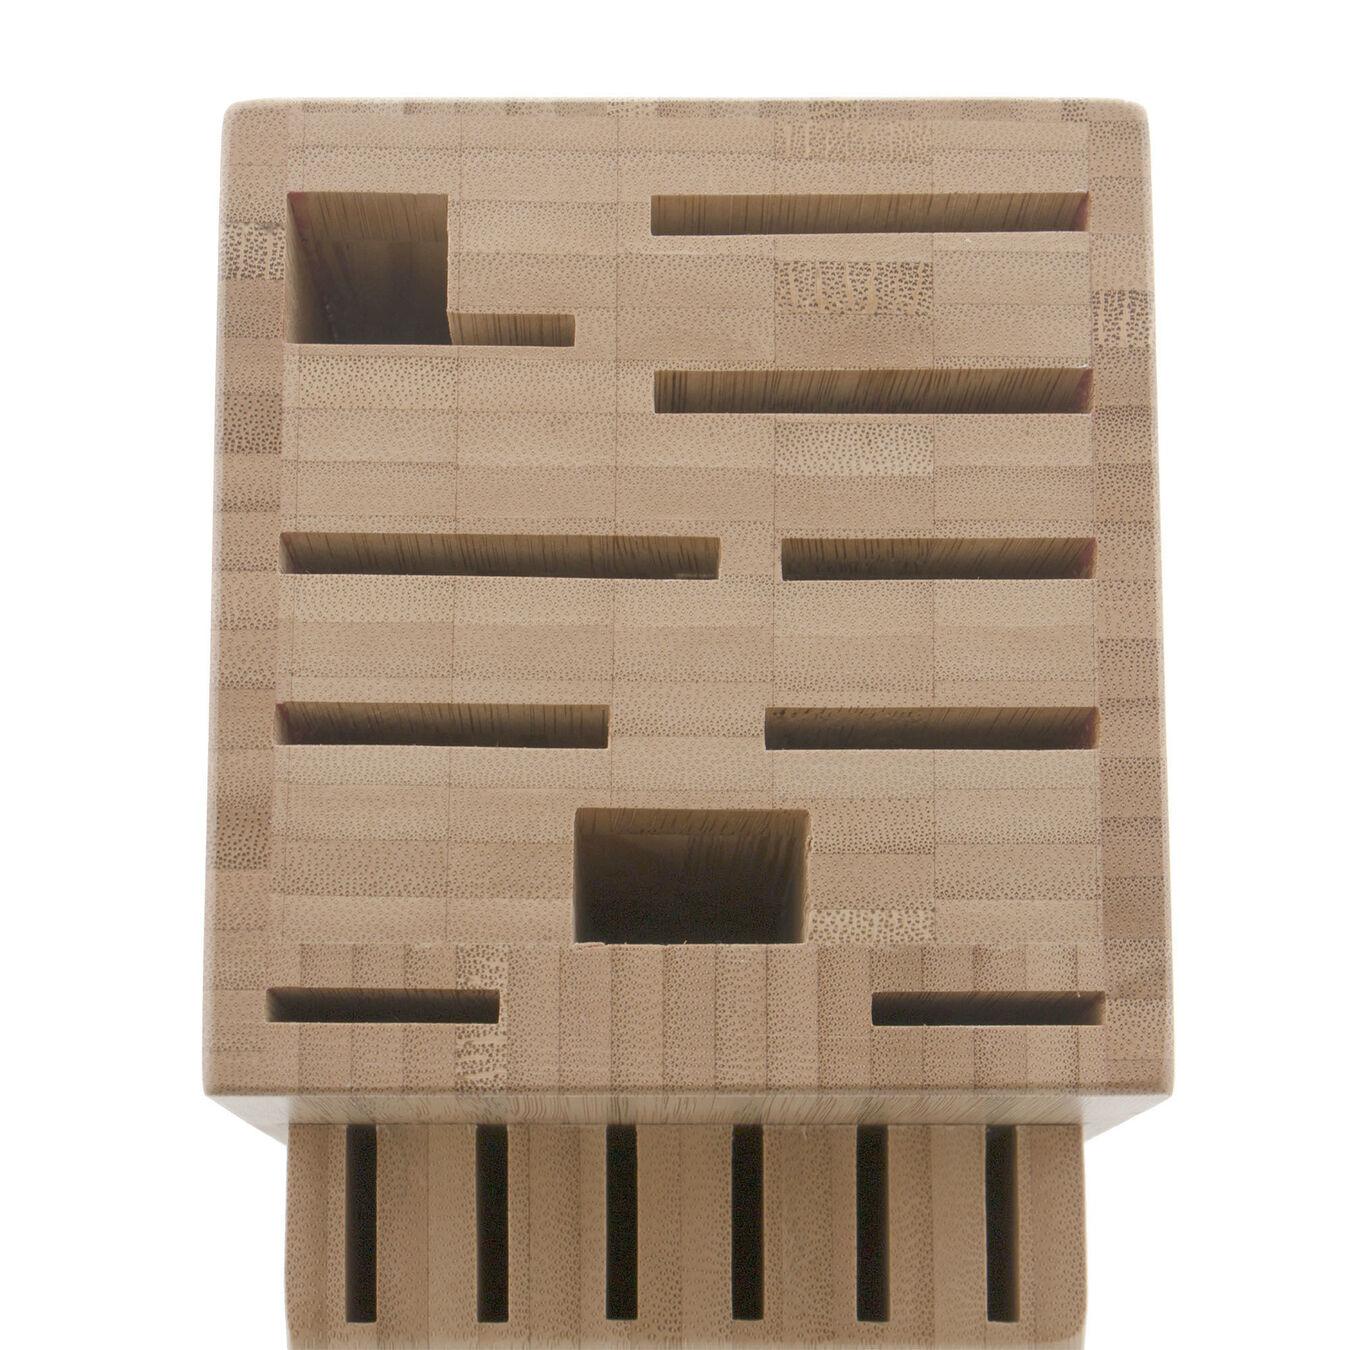 Bamboo 16-slot block,,large 3